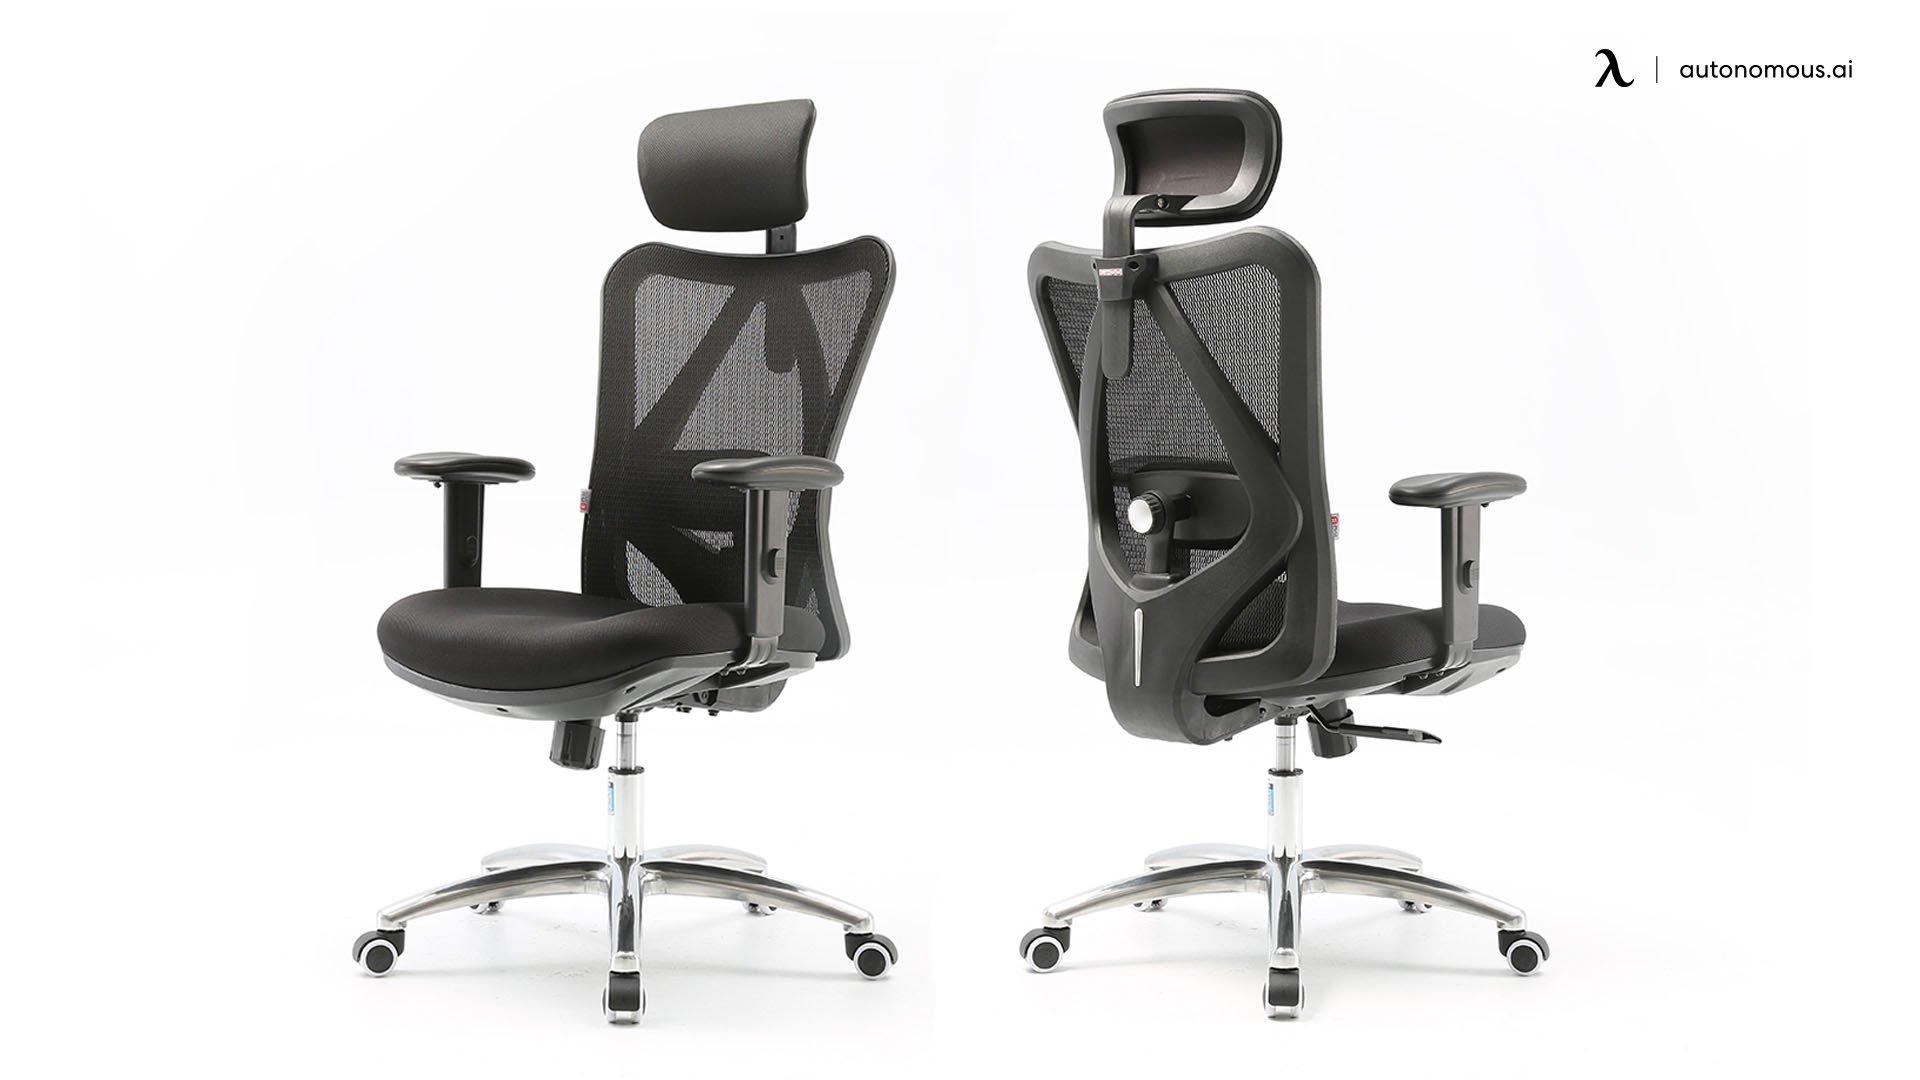 SIHOO M18 Office Chair